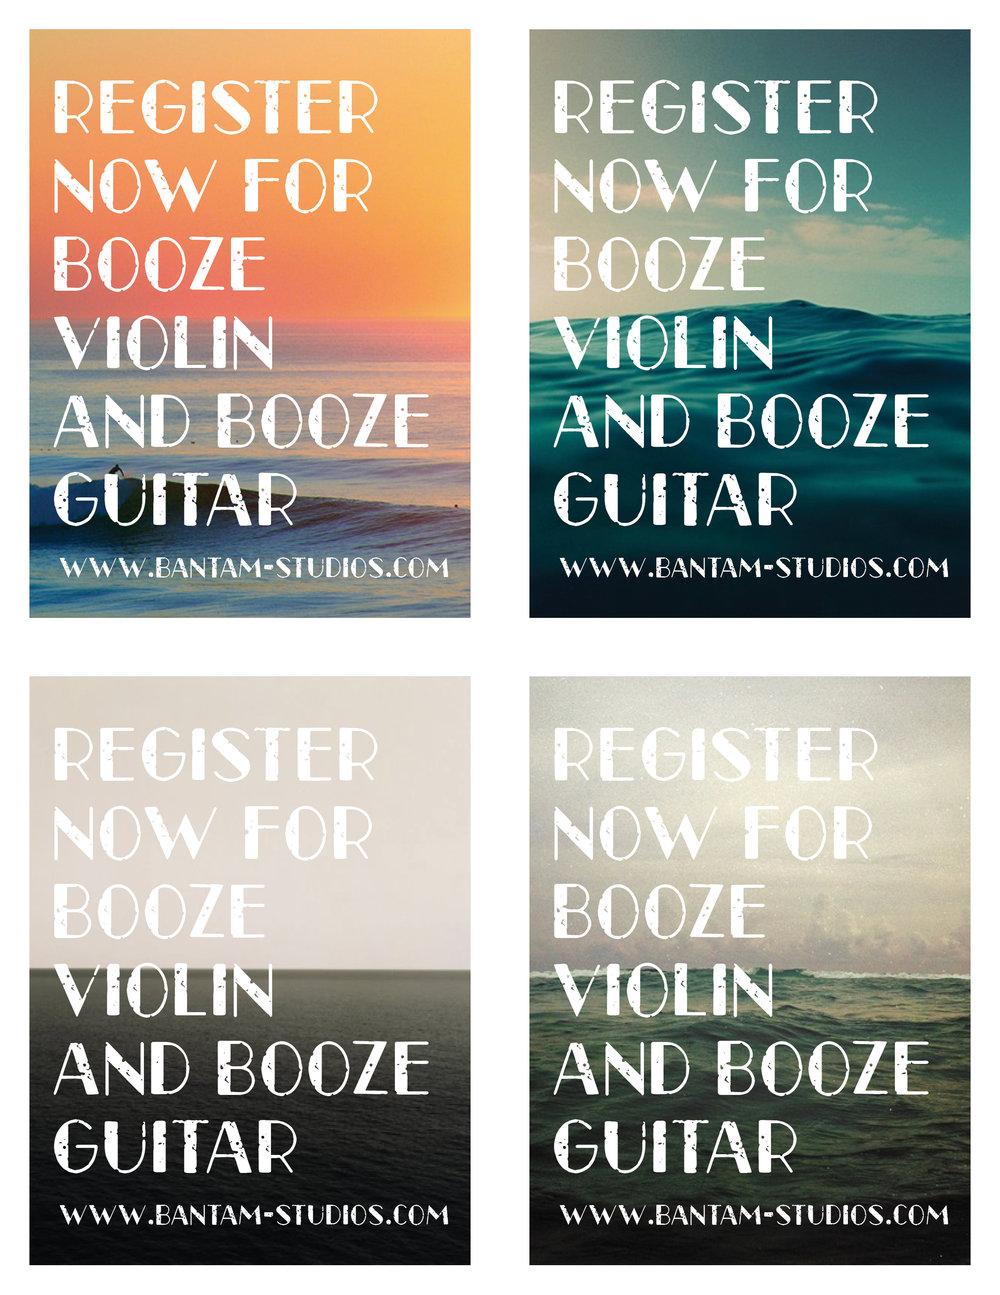 Booze Violin Fall 2014 Postcards3.jpg